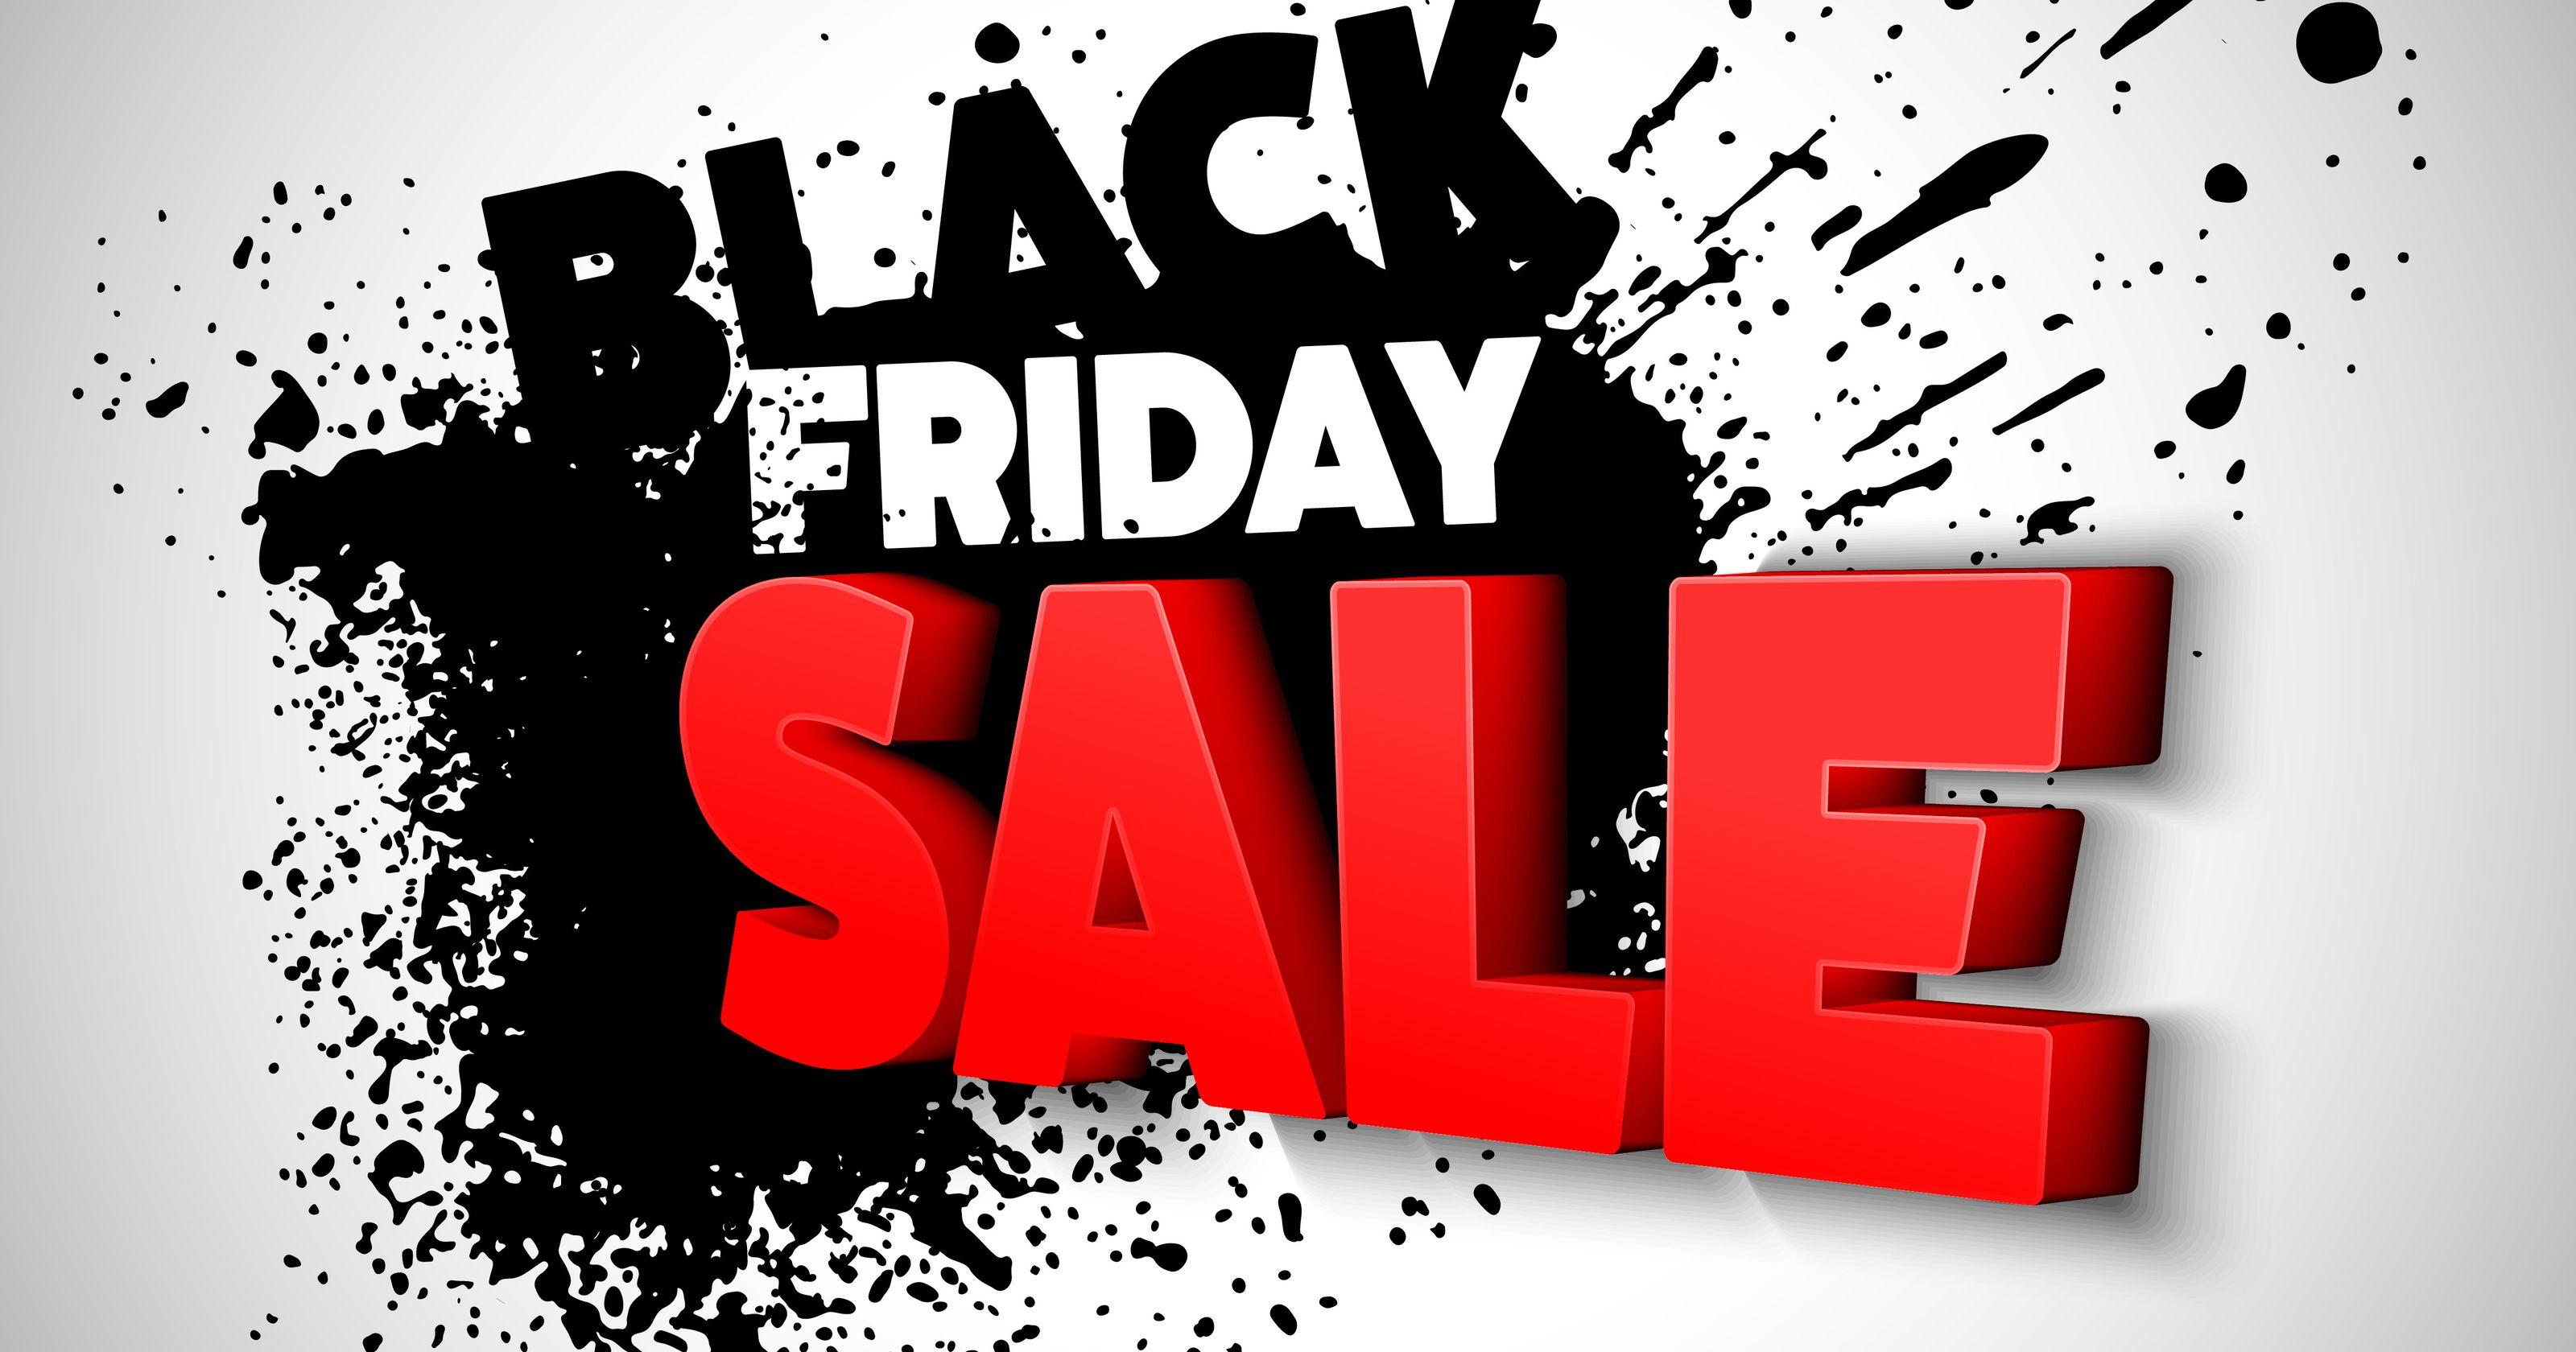 635822965962389142-Black-Friday-sale